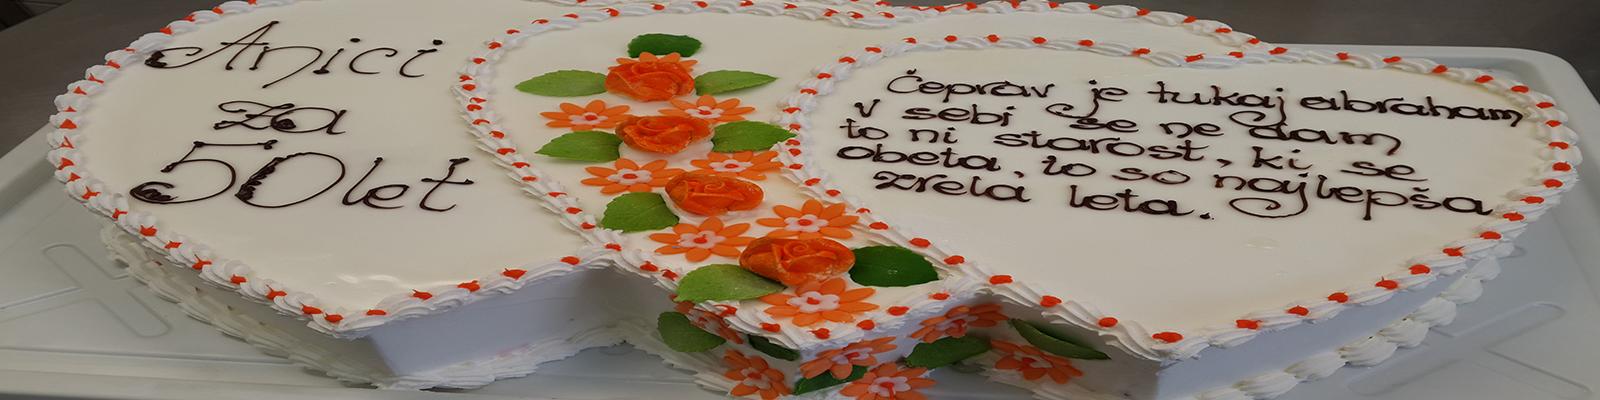 torta_ozadje